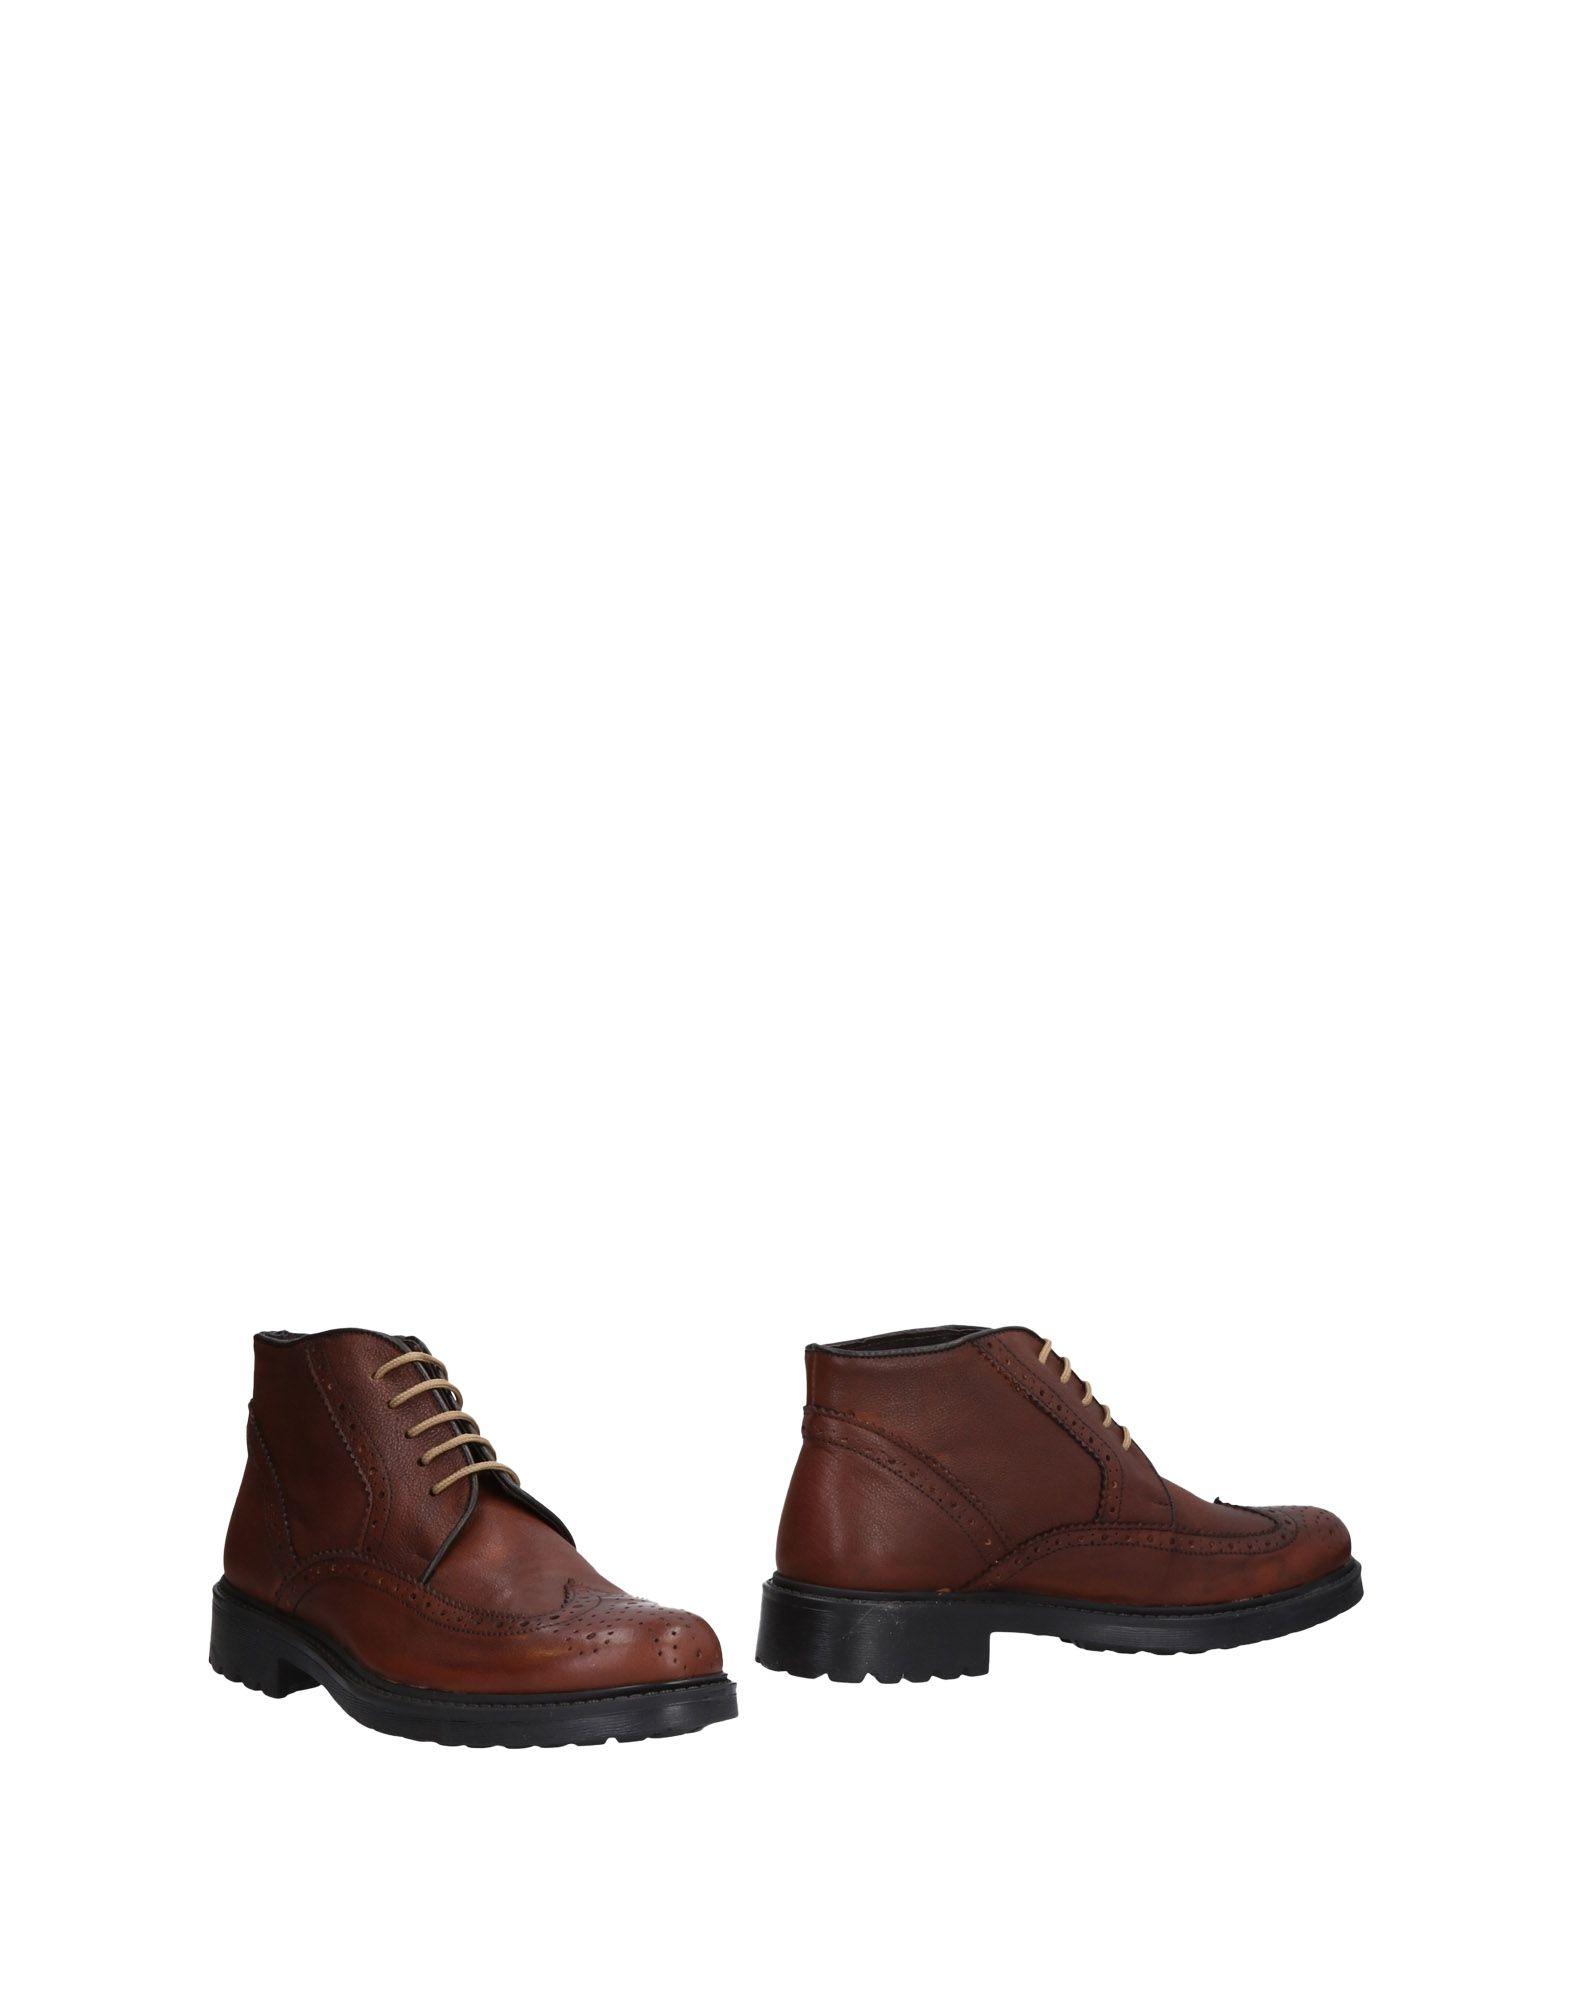 11468022LG Evocue Stiefelette Herren  11468022LG  Heiße Schuhe a21787